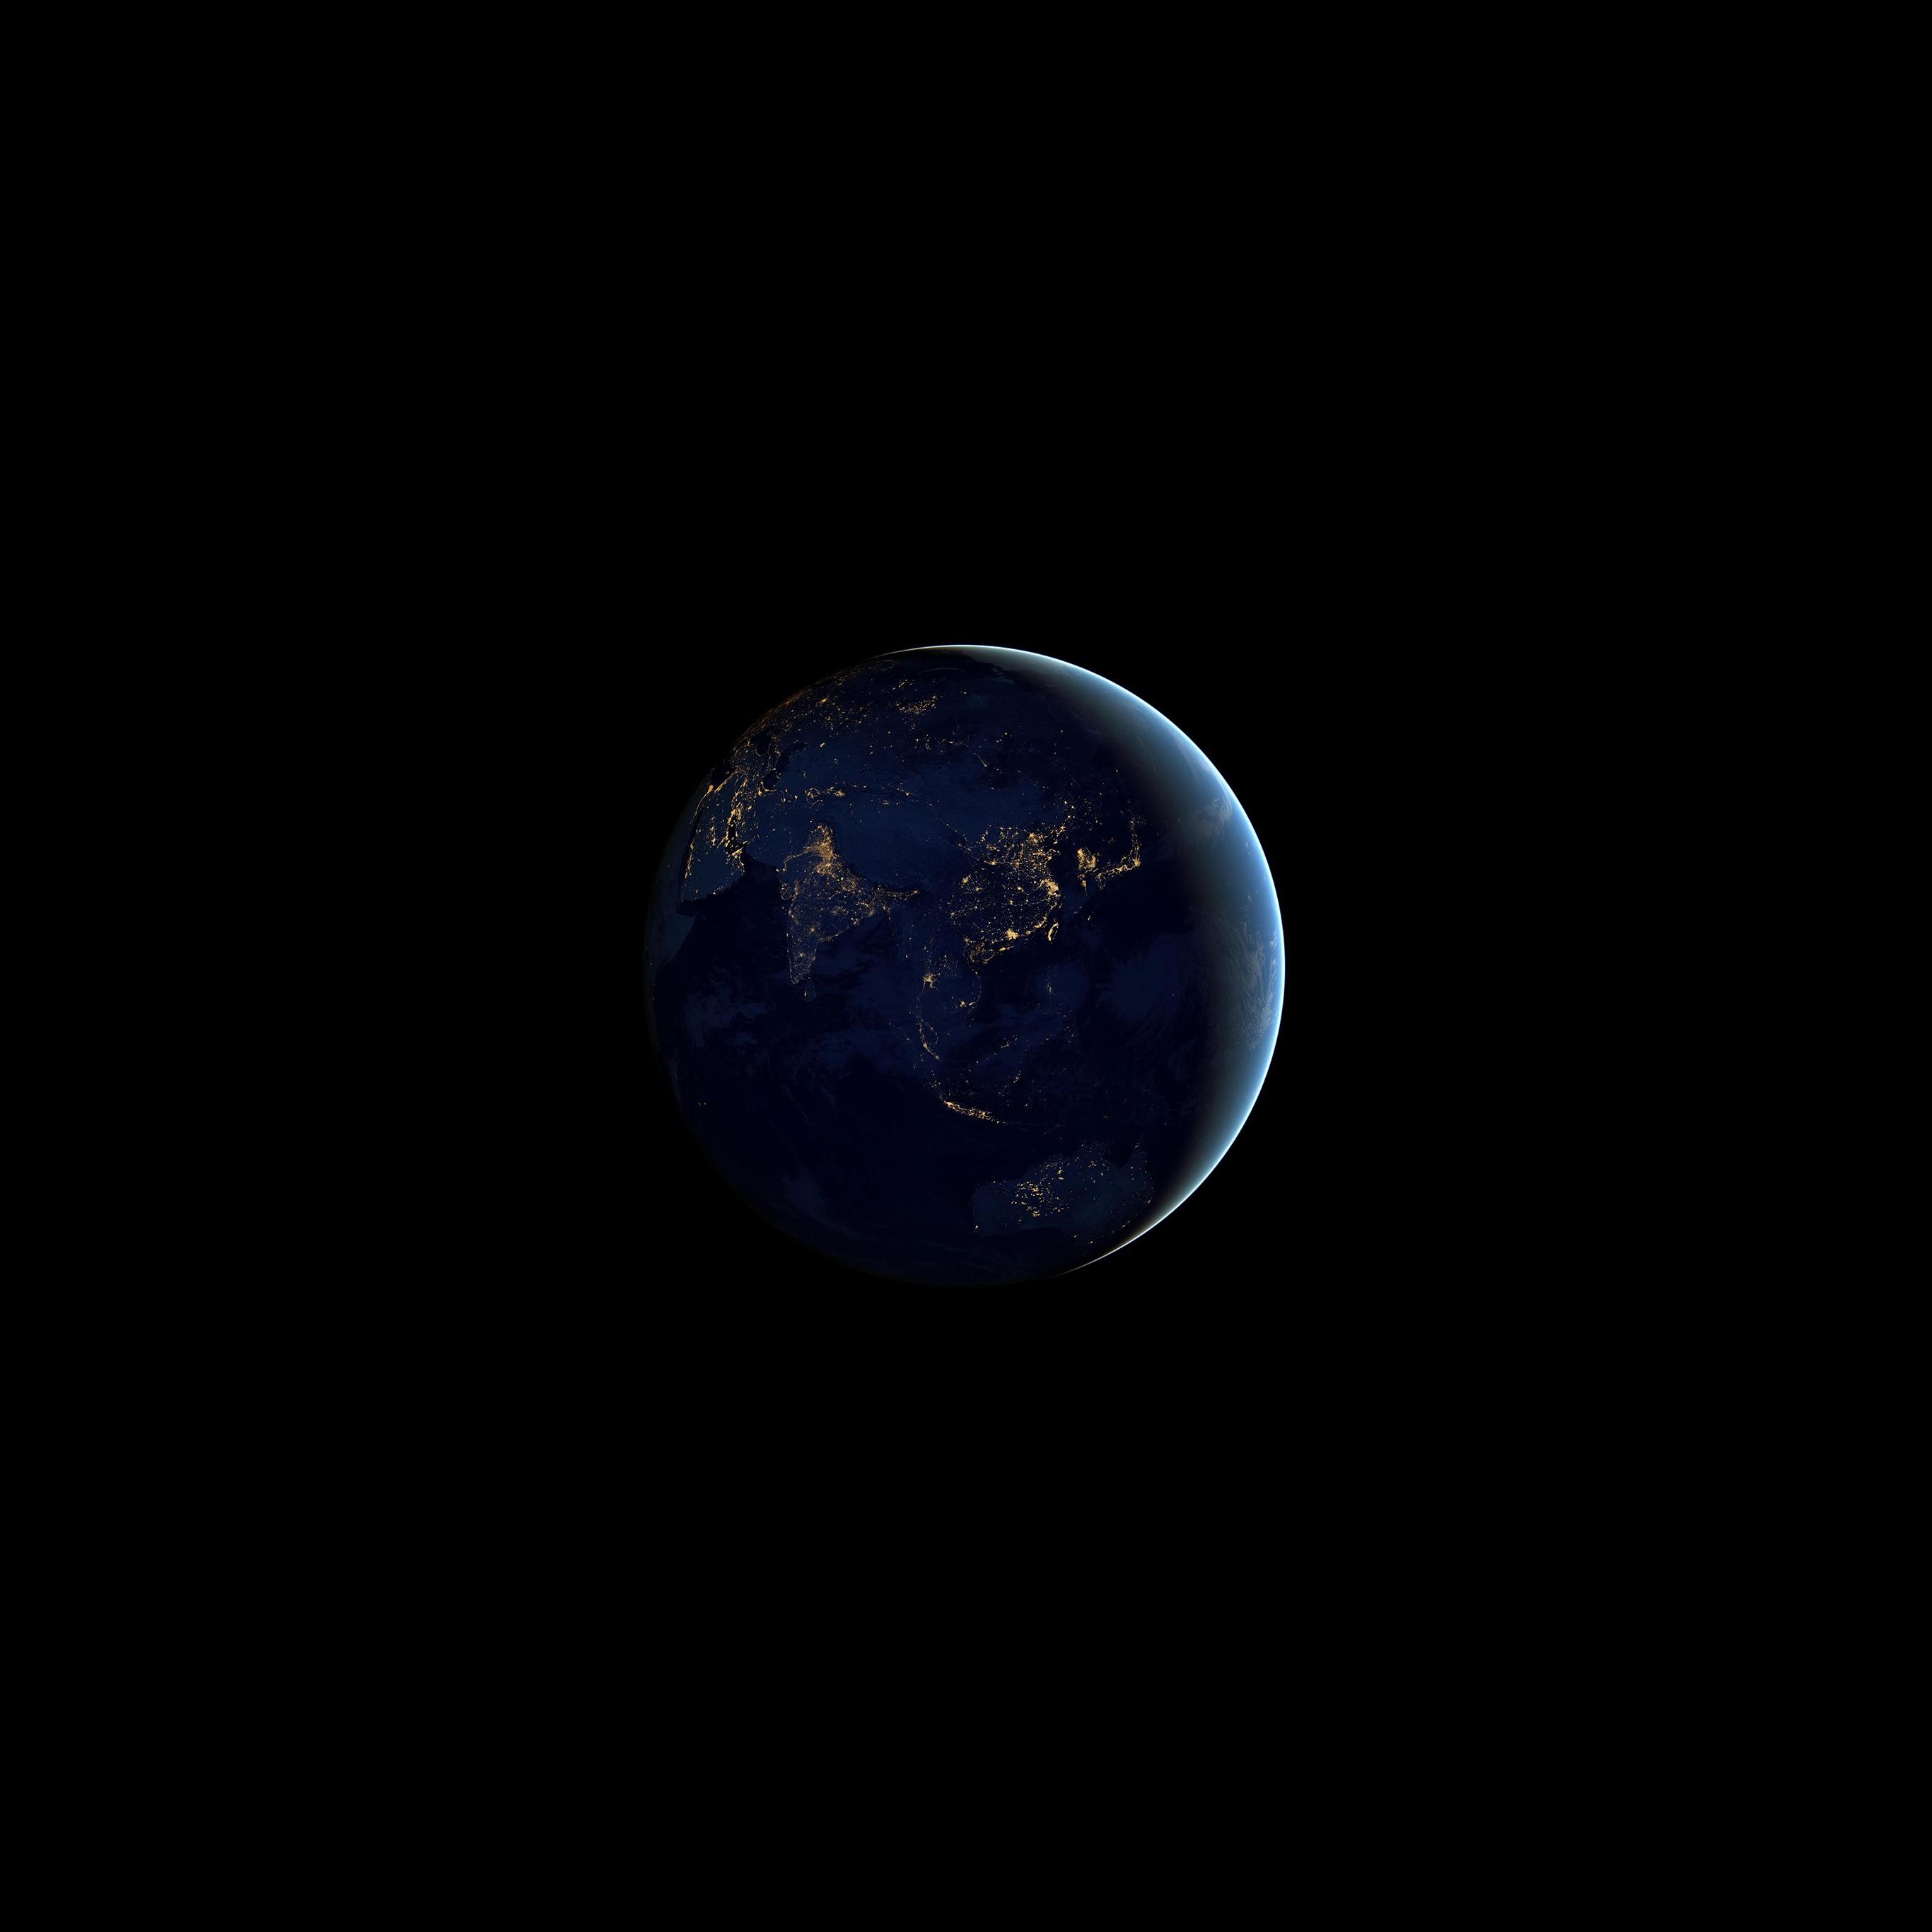 Google Earth Wallpaper: Aj69-asia-at-night-earth-space-dark